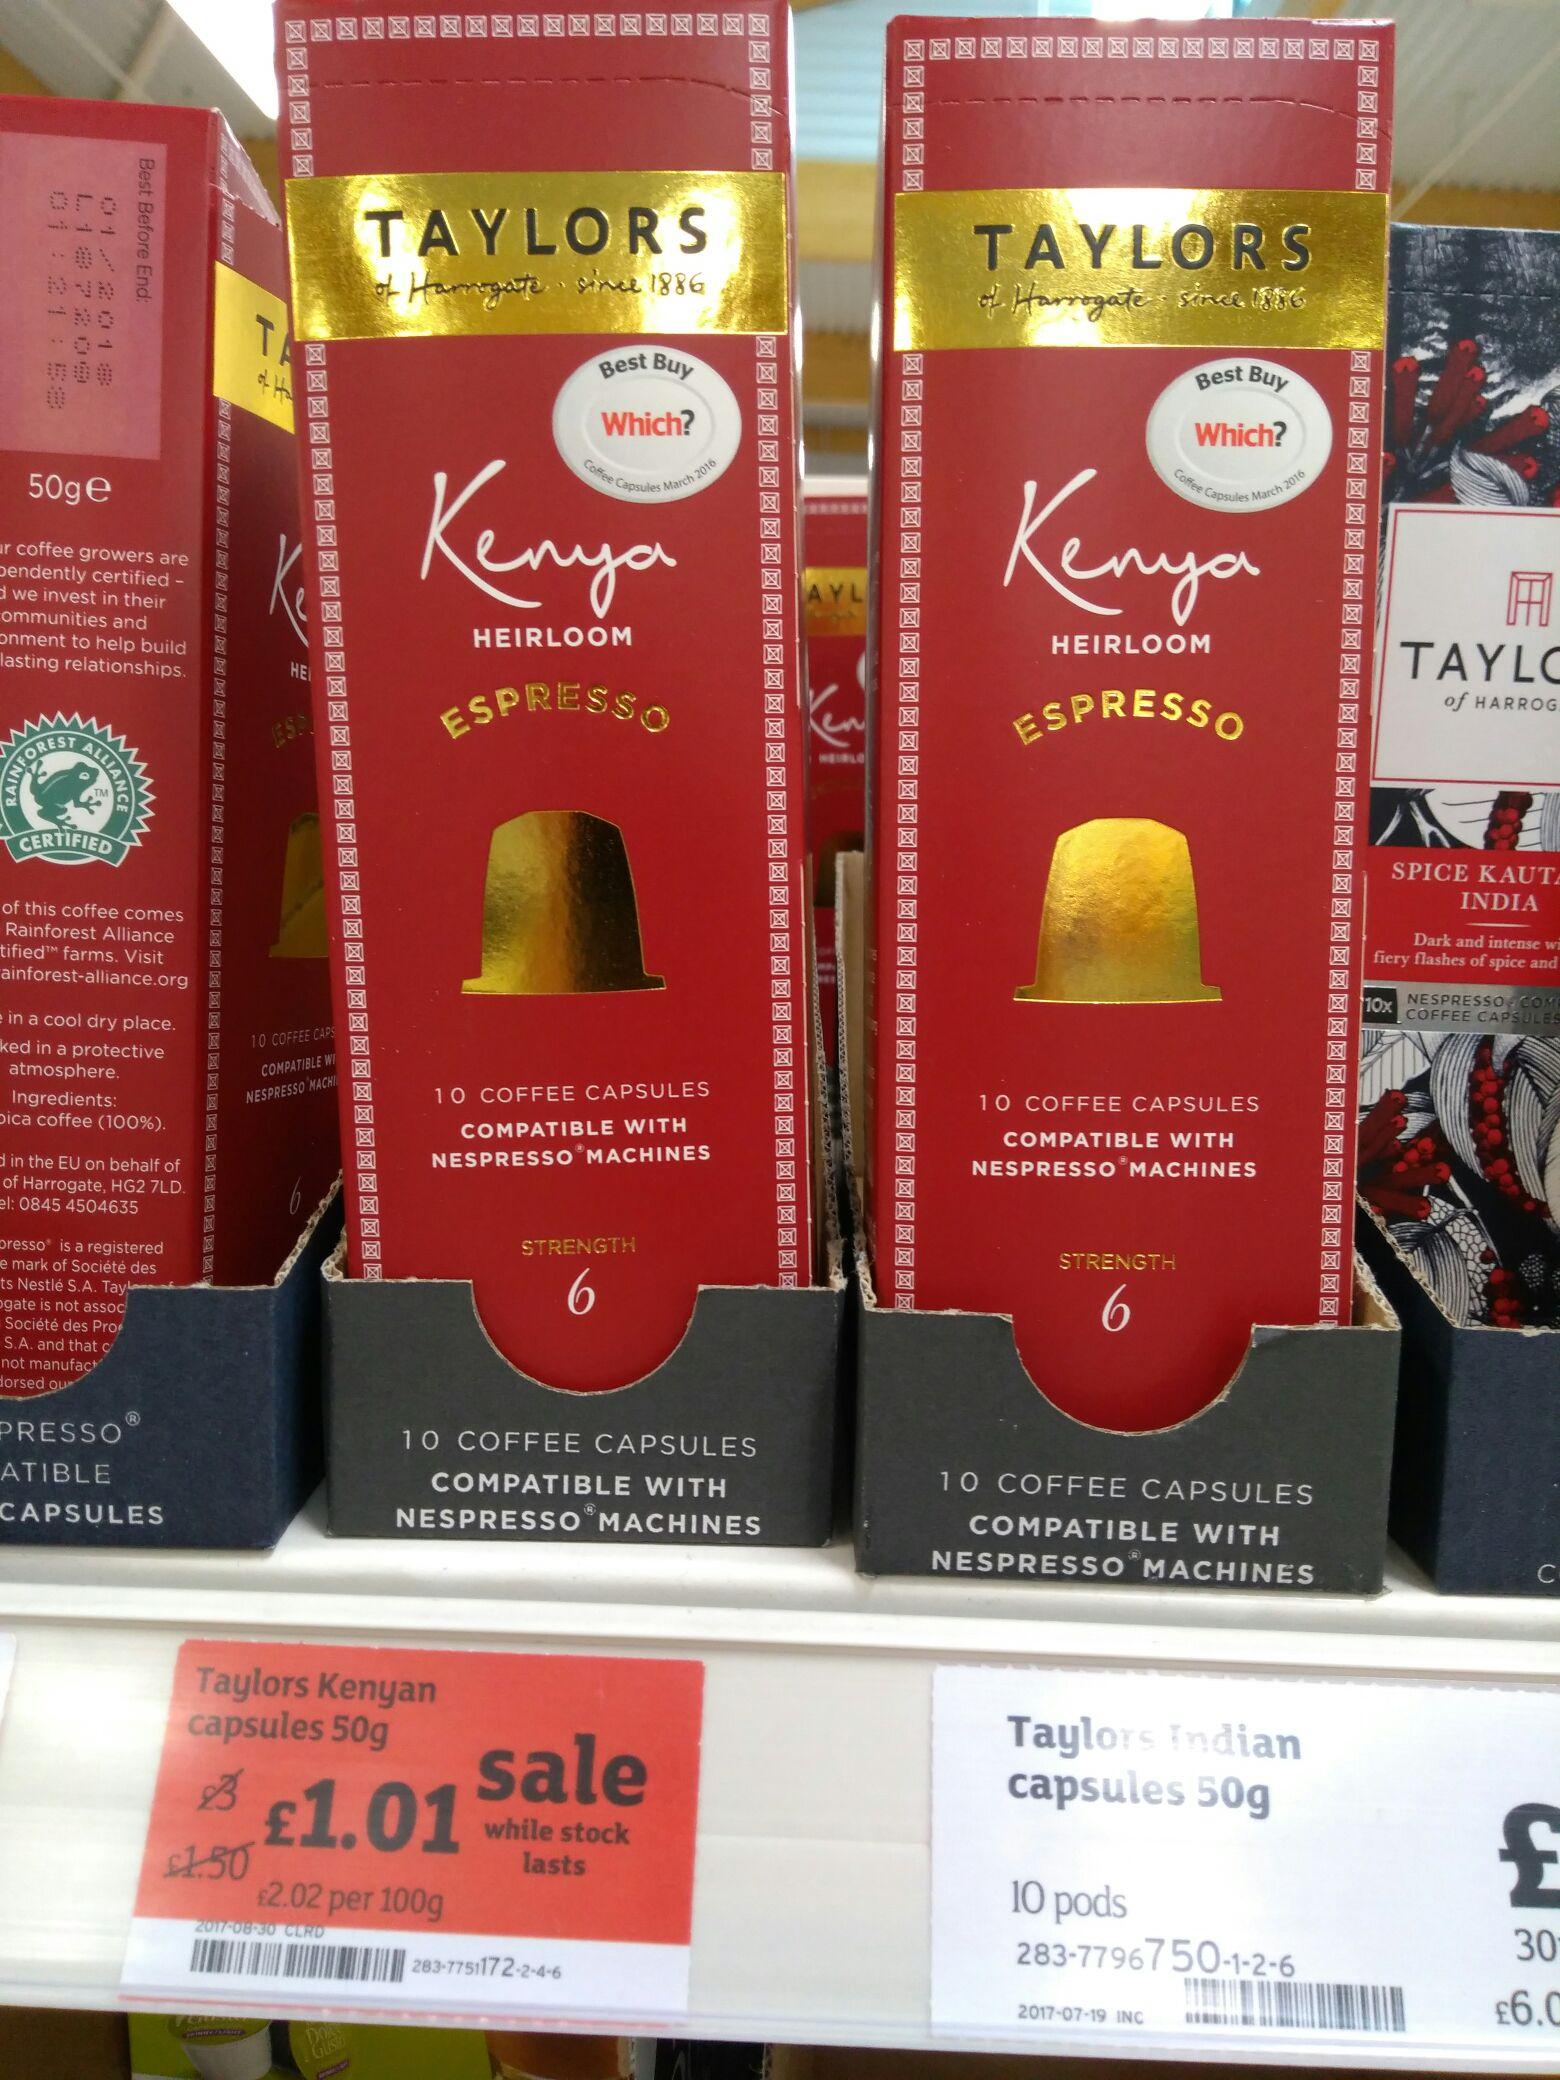 Taylors of Harrogate Nespresso capsules - 10 for £1.01 at Sainsbury's Wadsley Bridge Sheffield